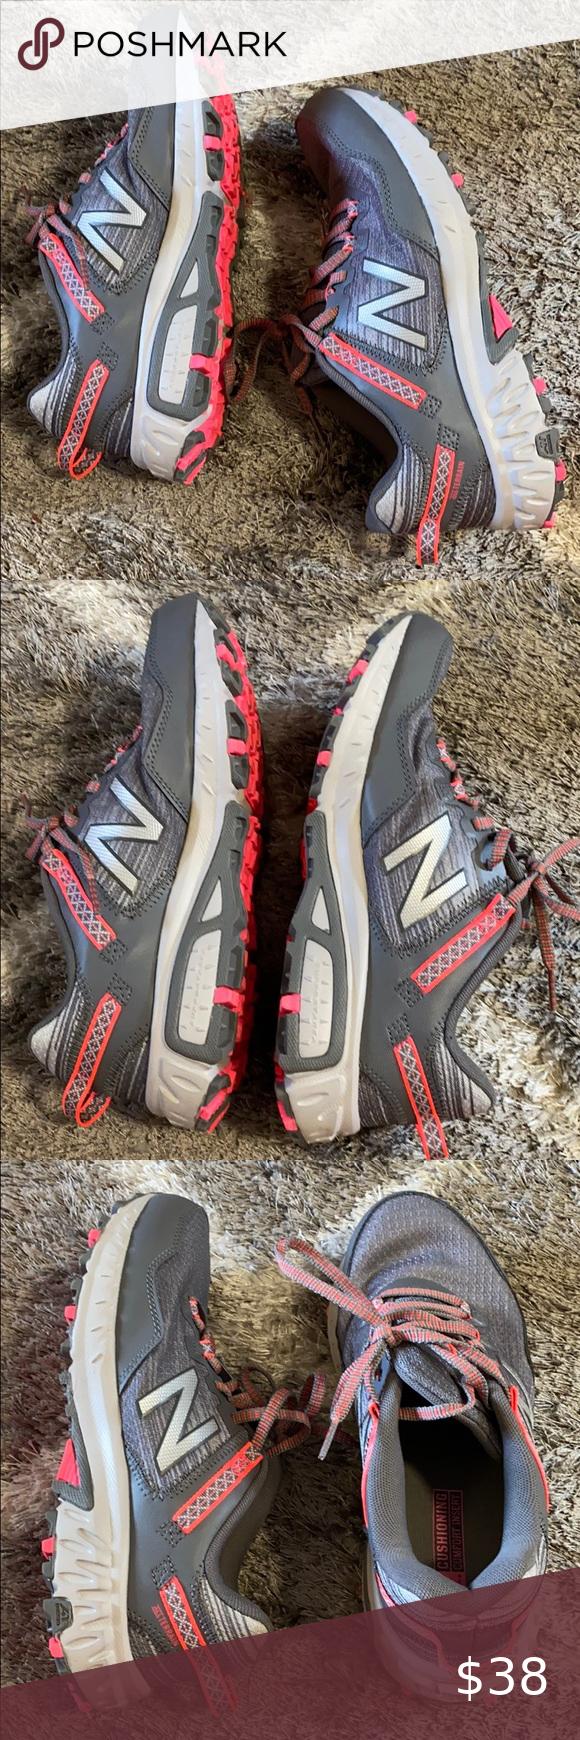 Trail running shoes, New balance women